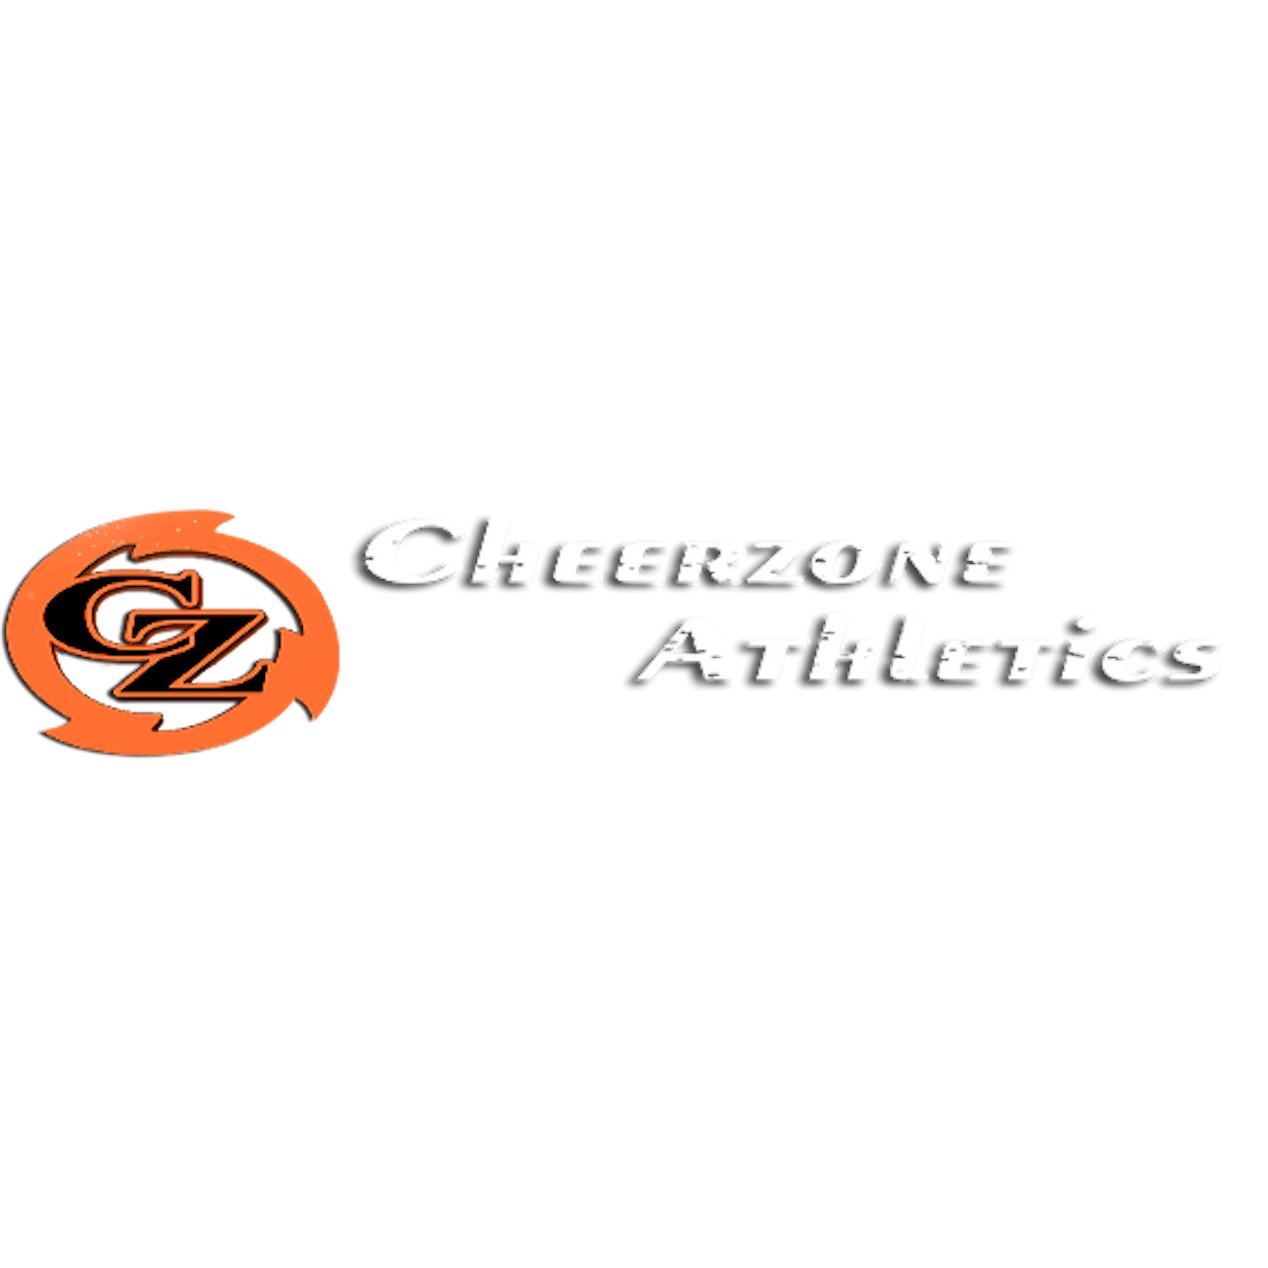 Cheer Zone Athletics - Saucier, MS - Sports Clubs